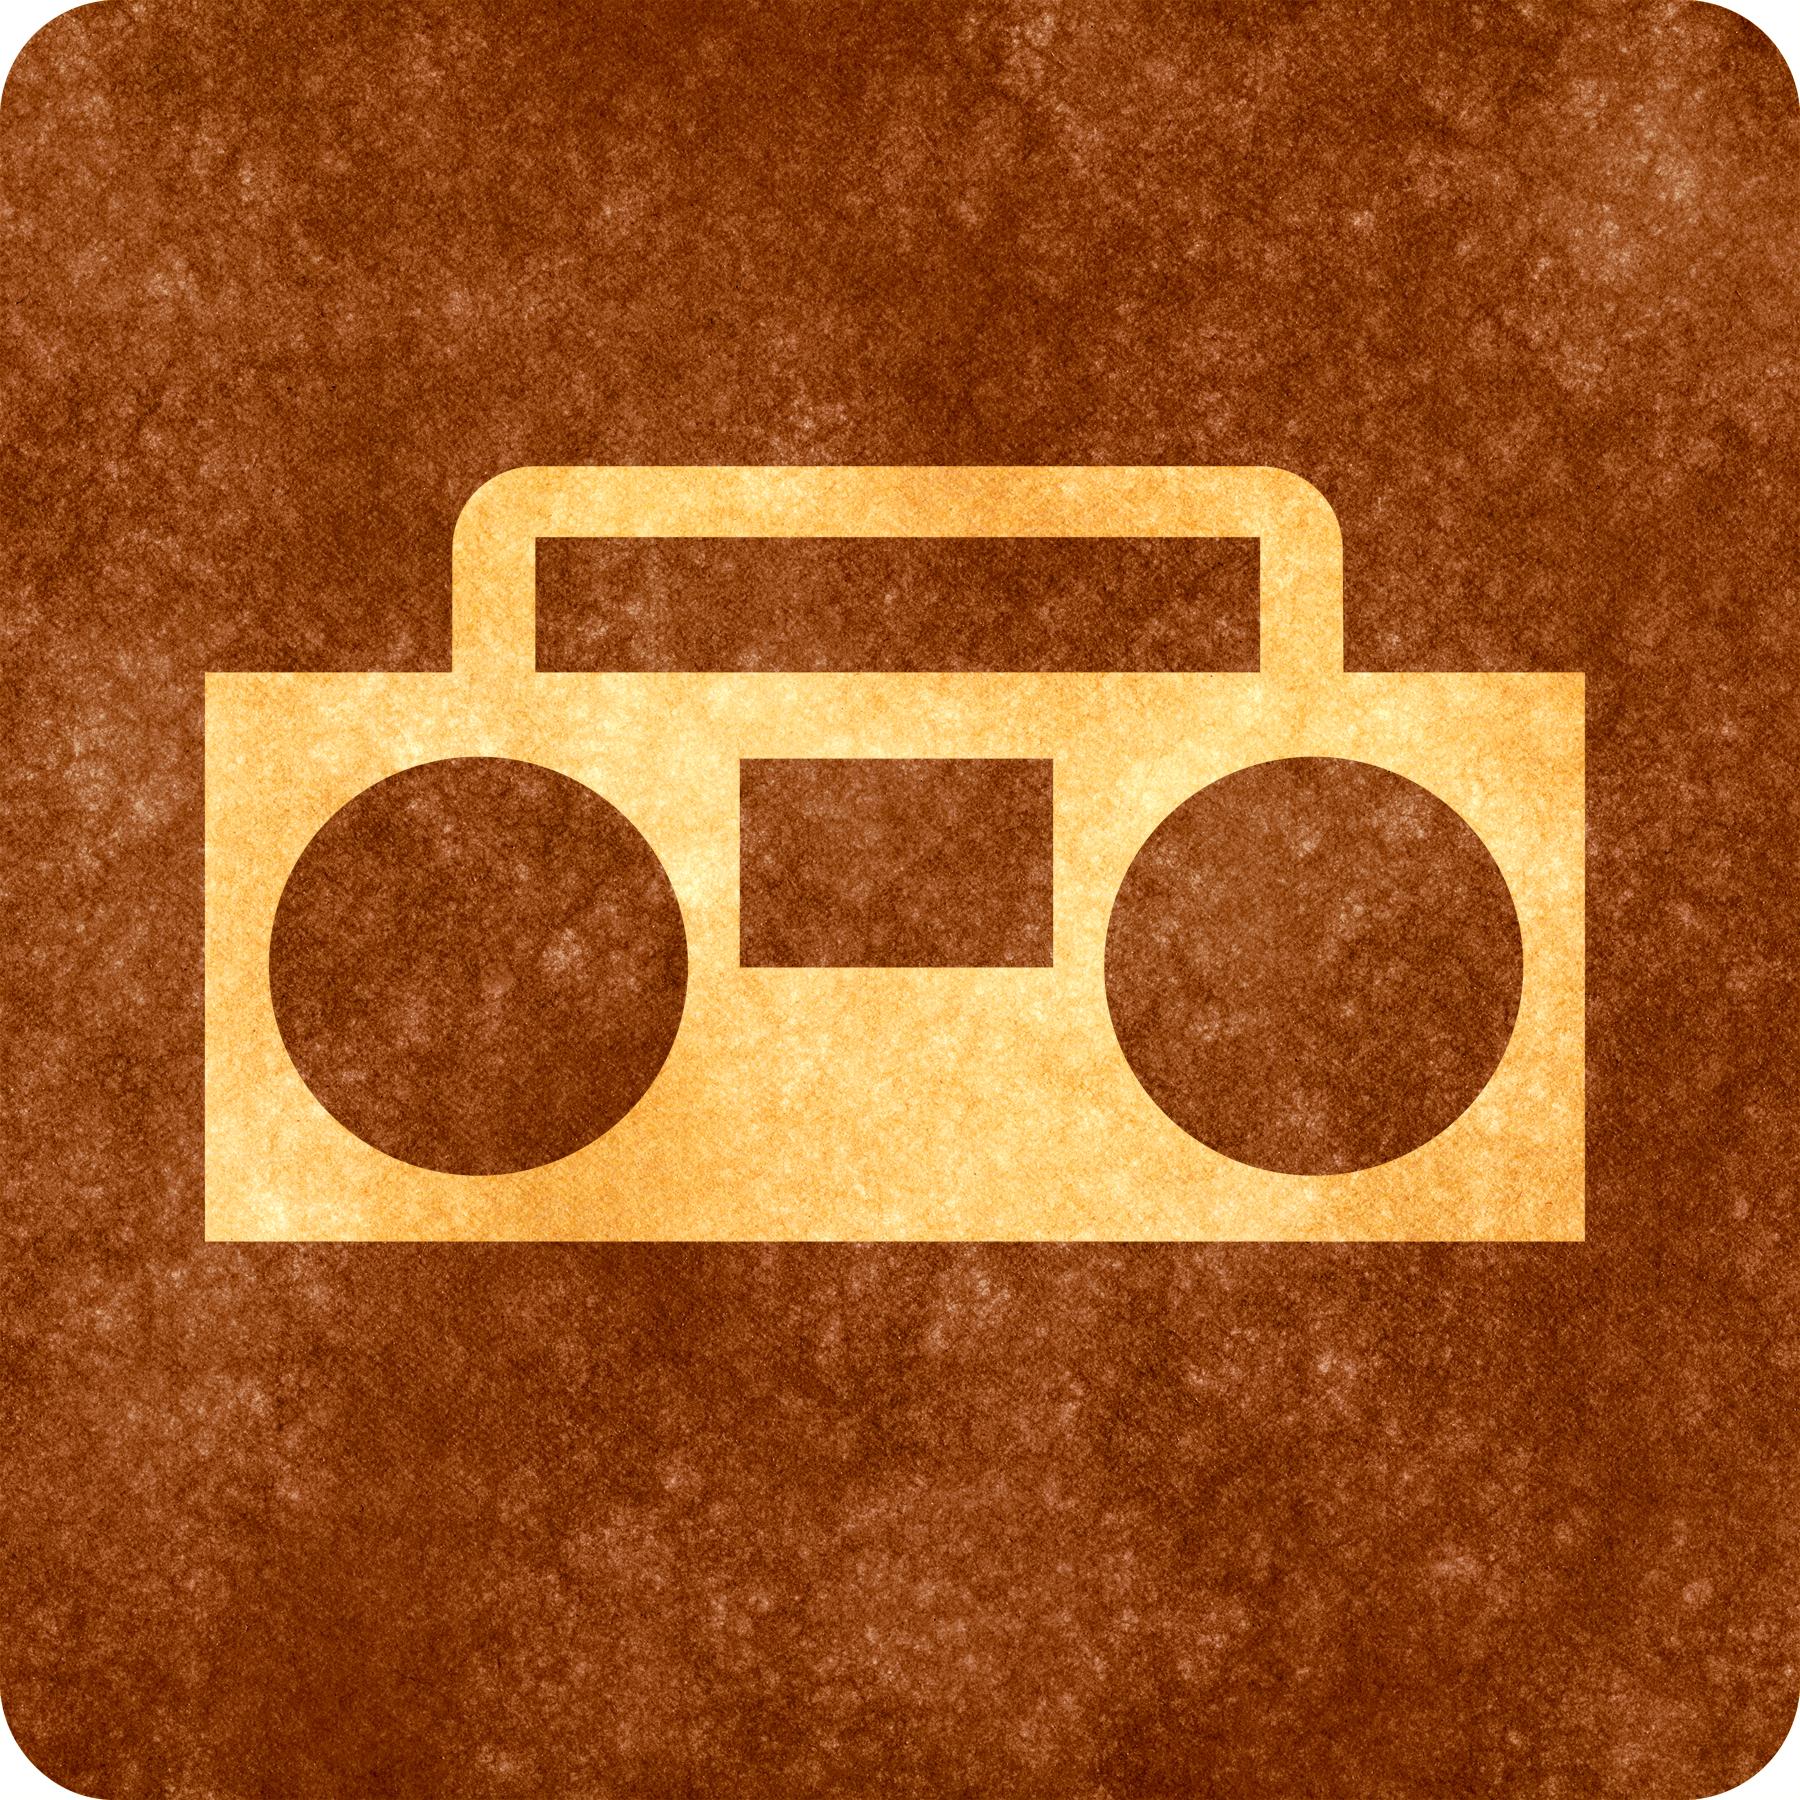 Sepia grunge sign - radio player photo